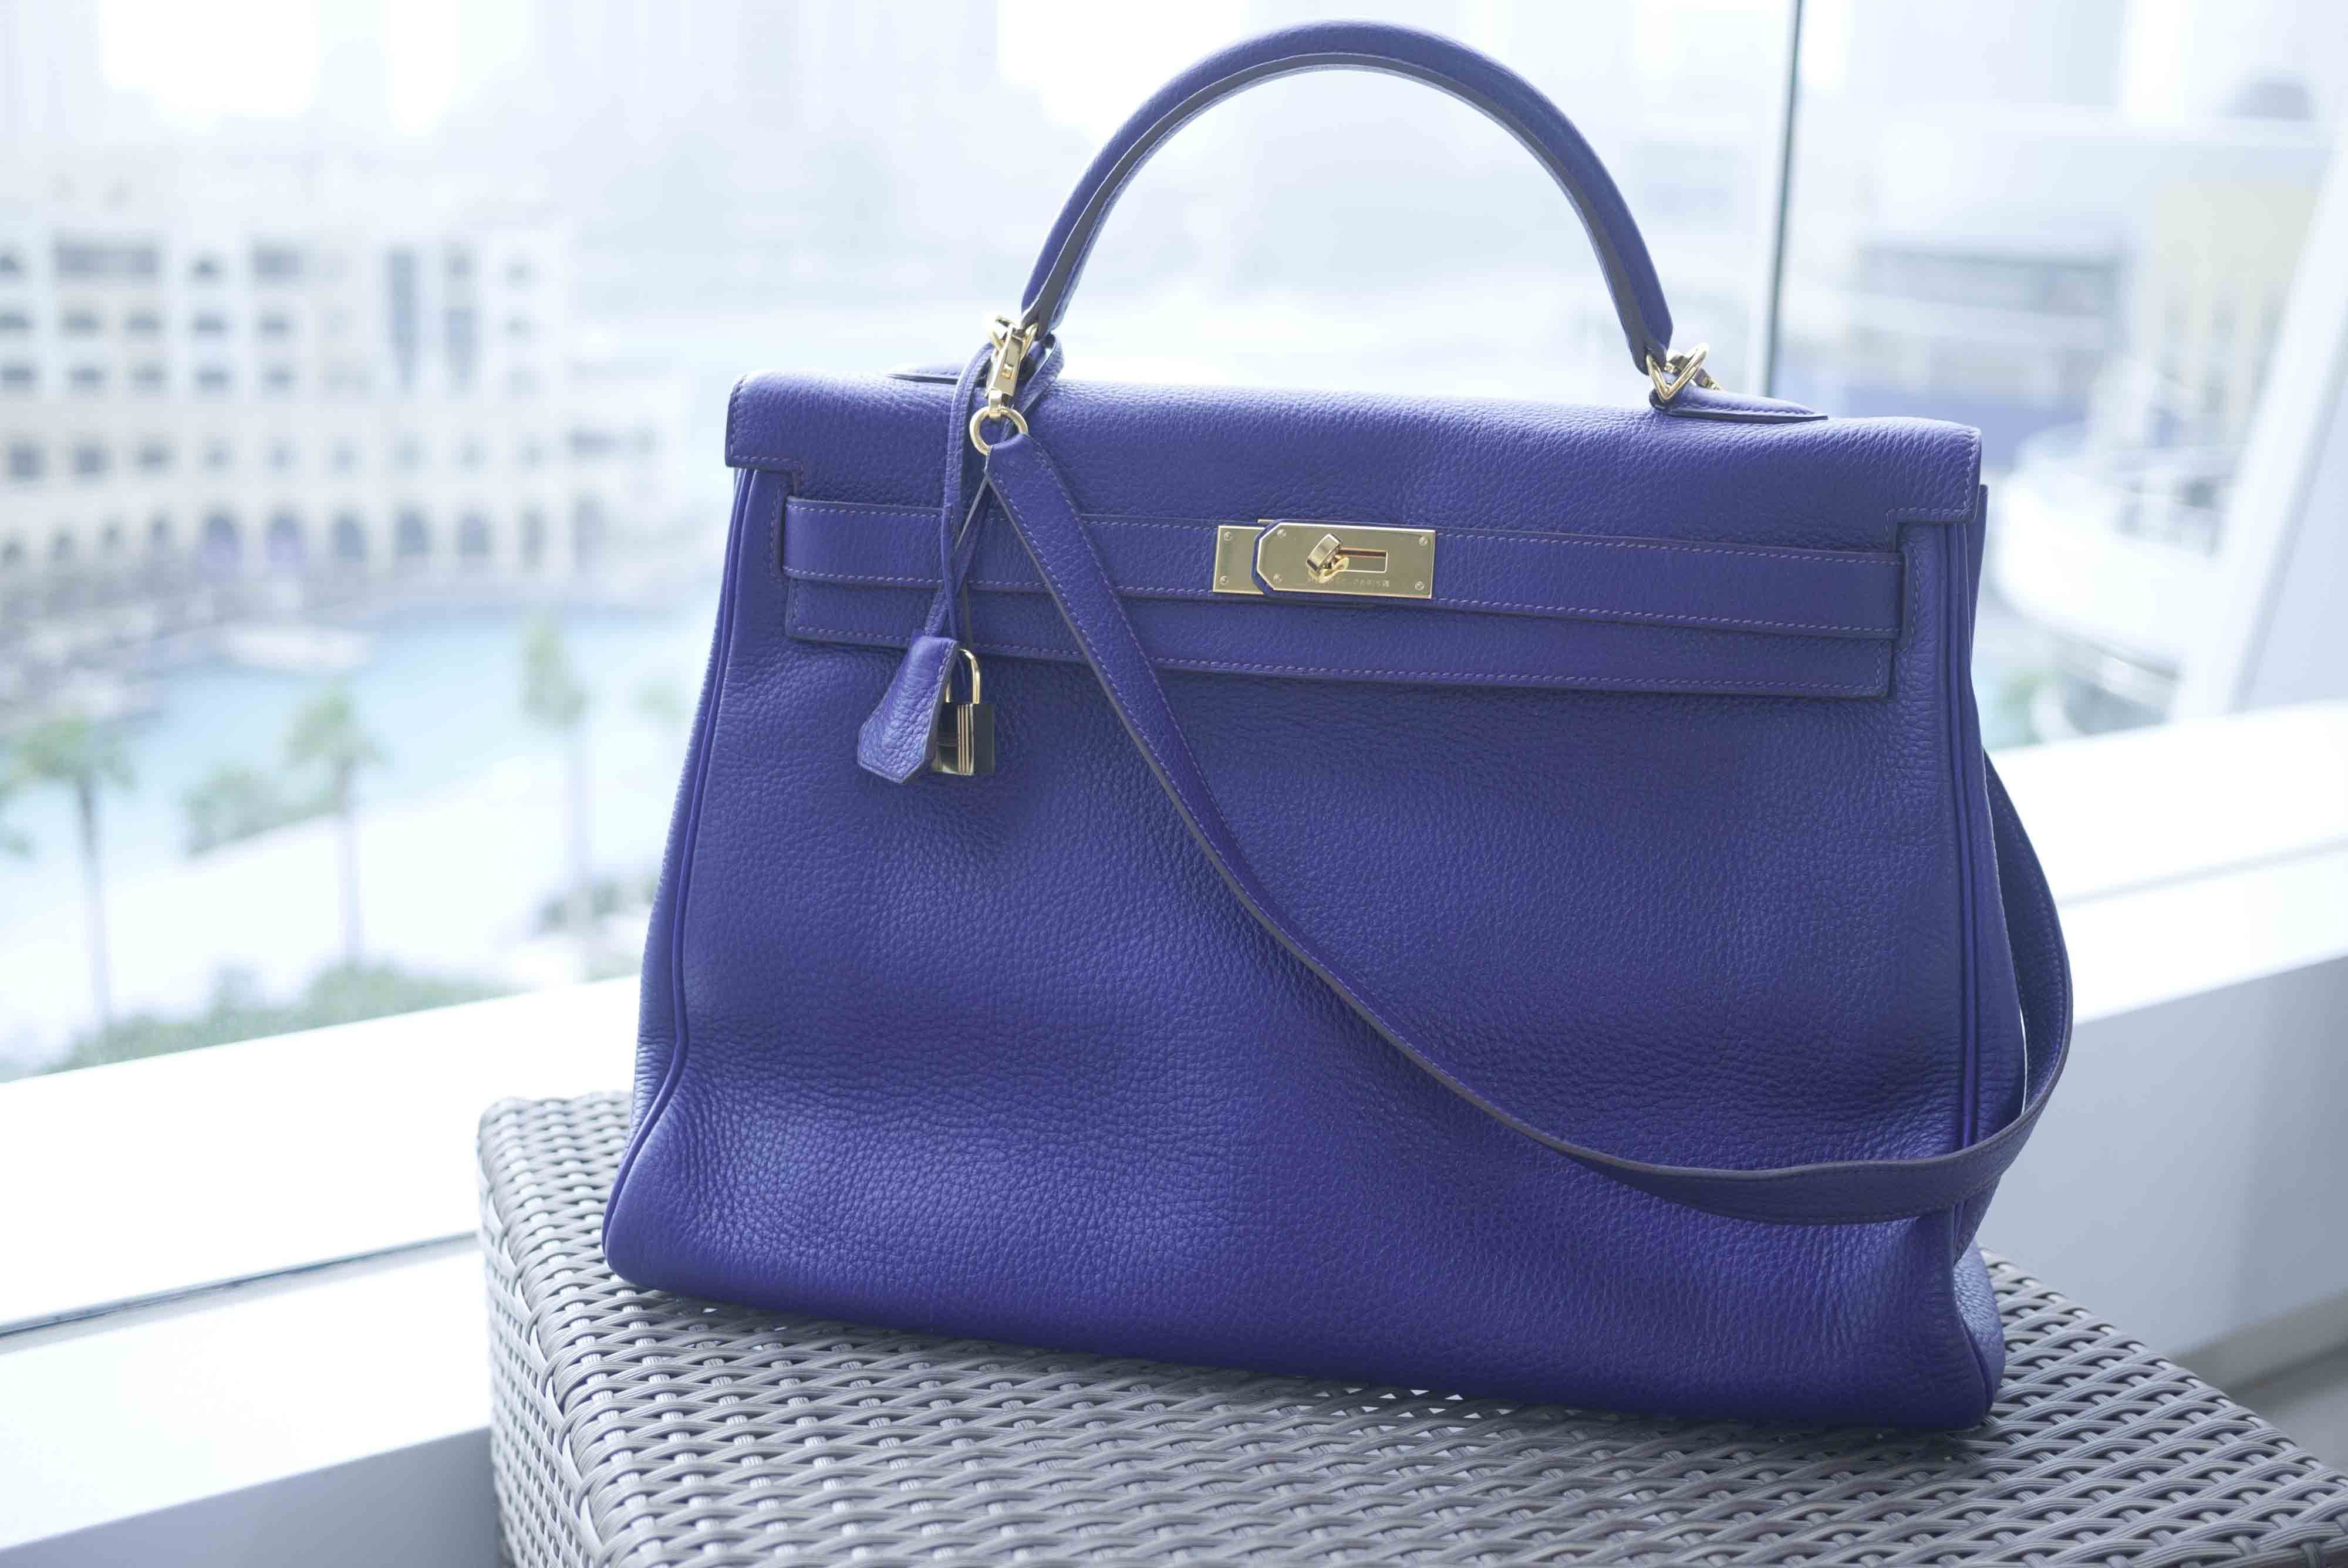 Rewind In Dubai Vintage Handbags Bags Top Handle Bag